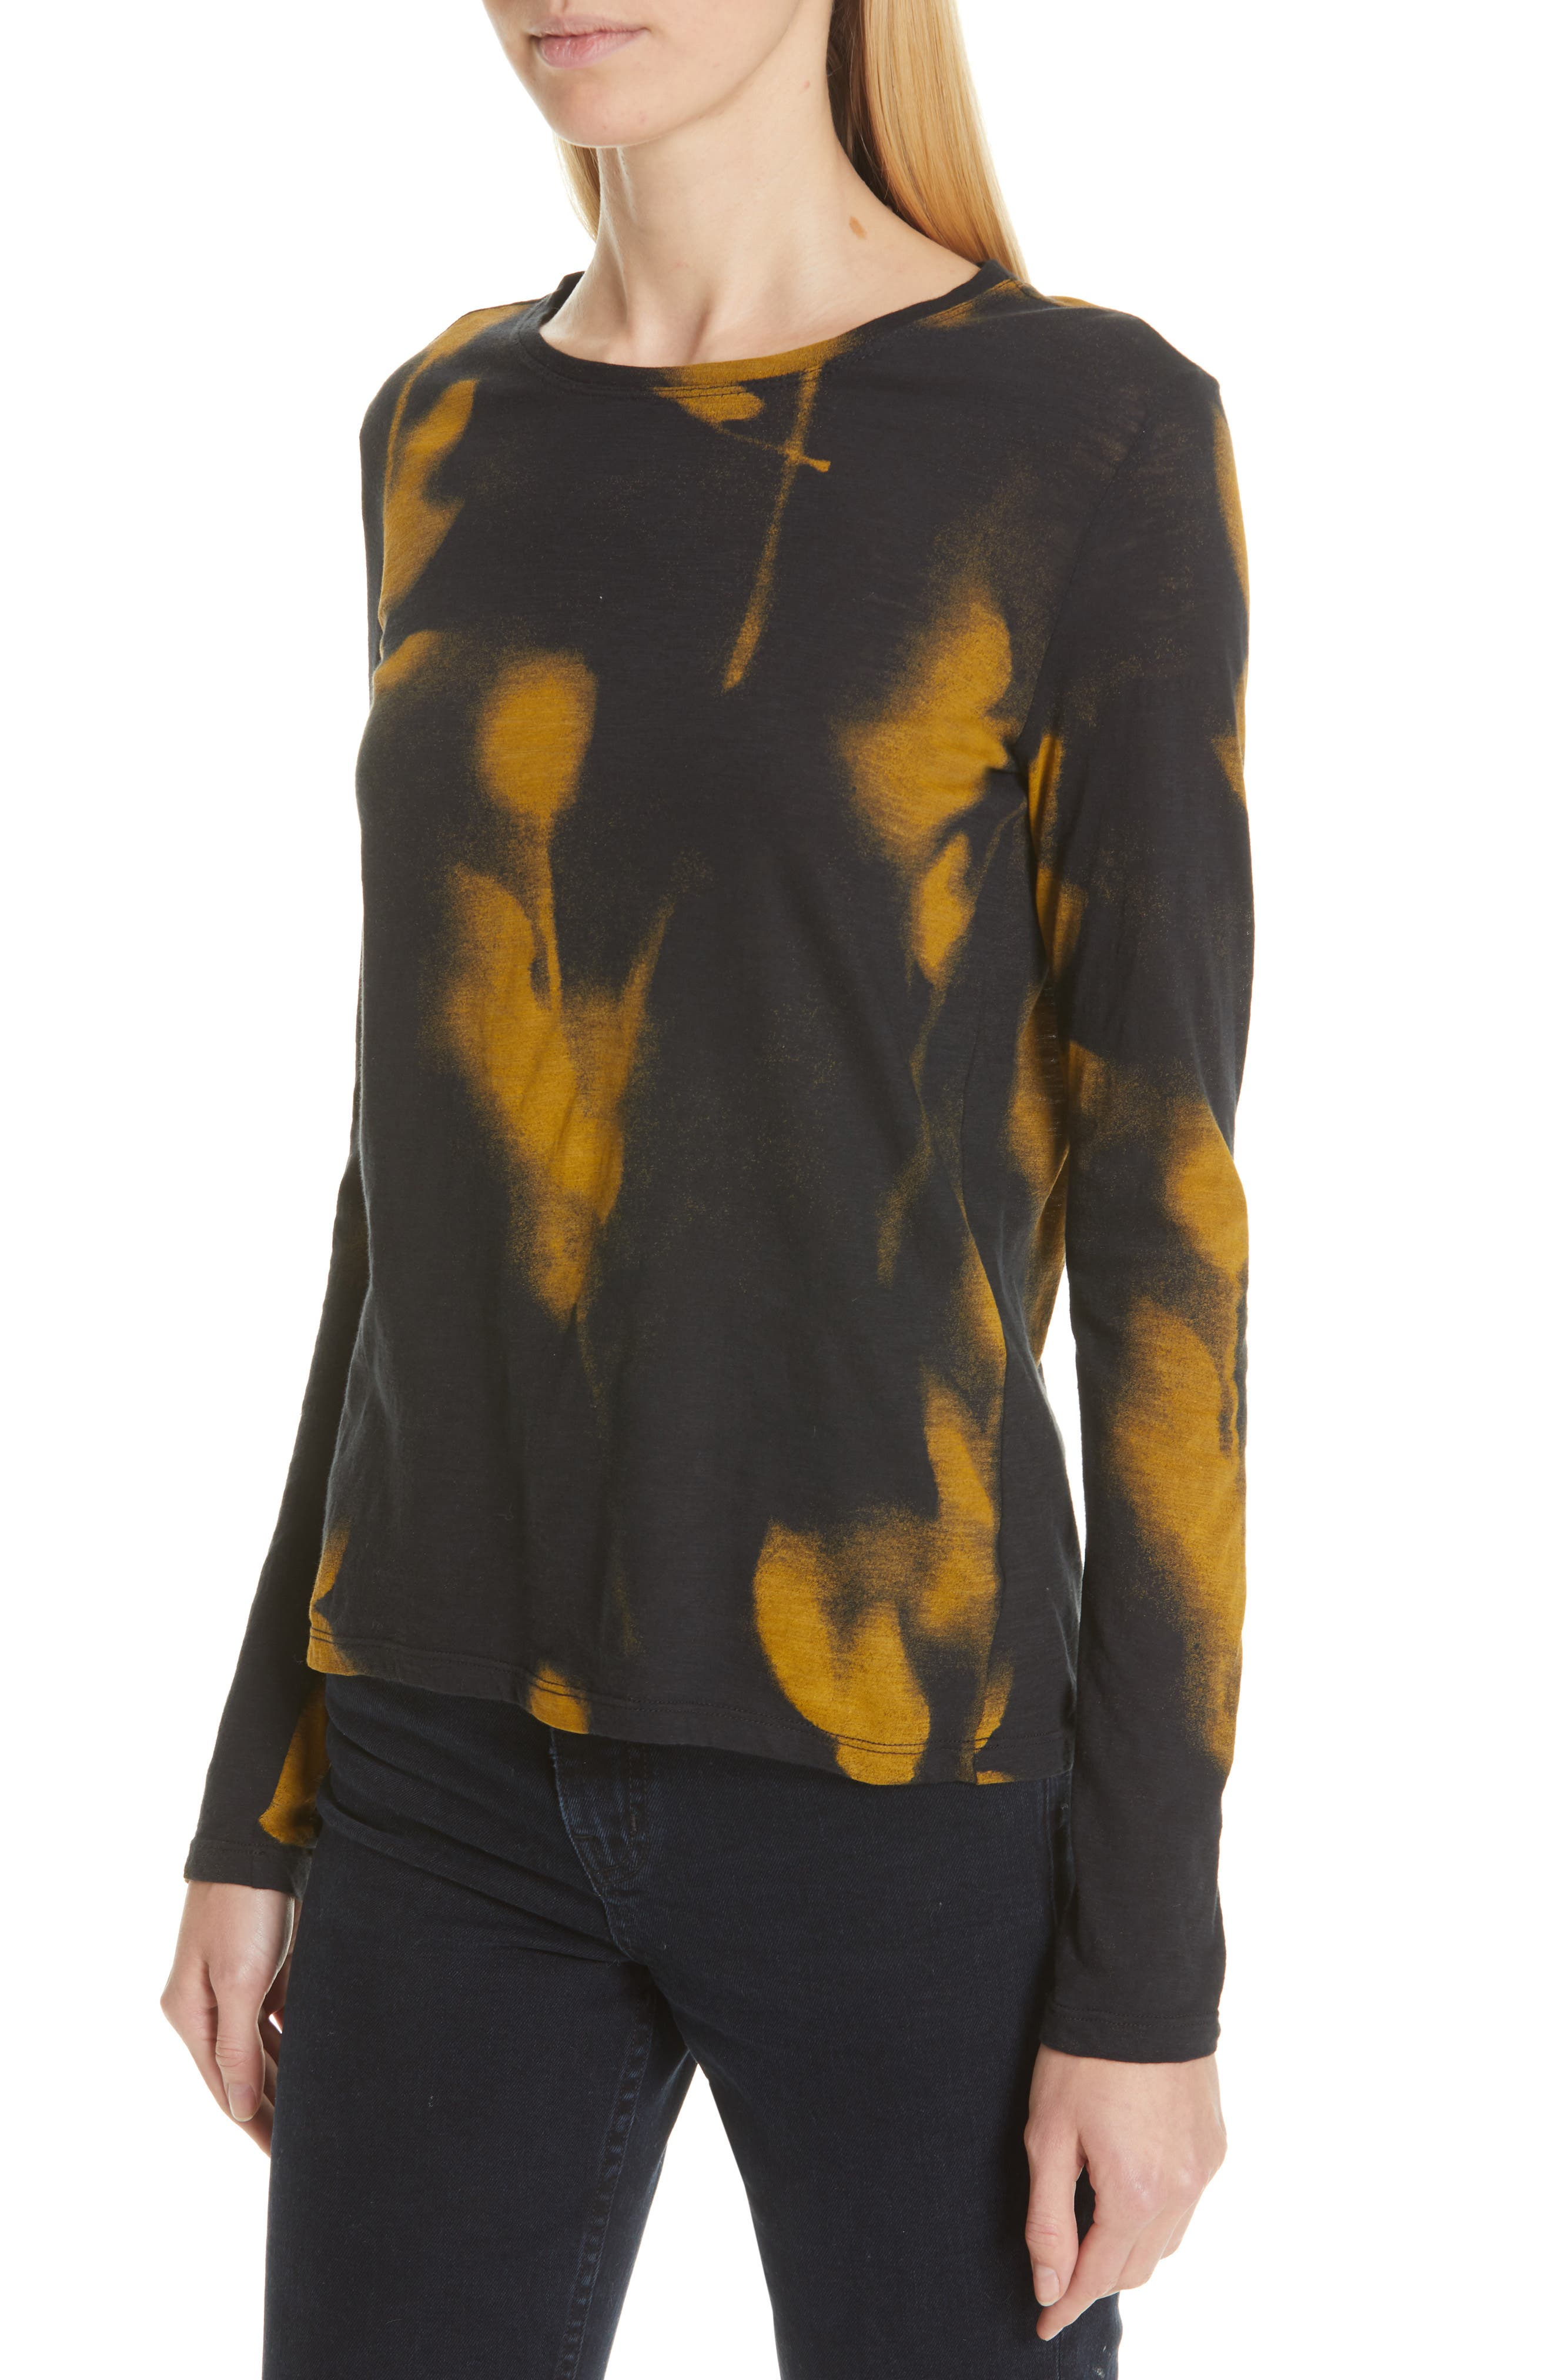 PROENZA SCHOULER, Print Jersey Tee, Alternate thumbnail 4, color, YELLOW/ BLACK ROSE PRINT